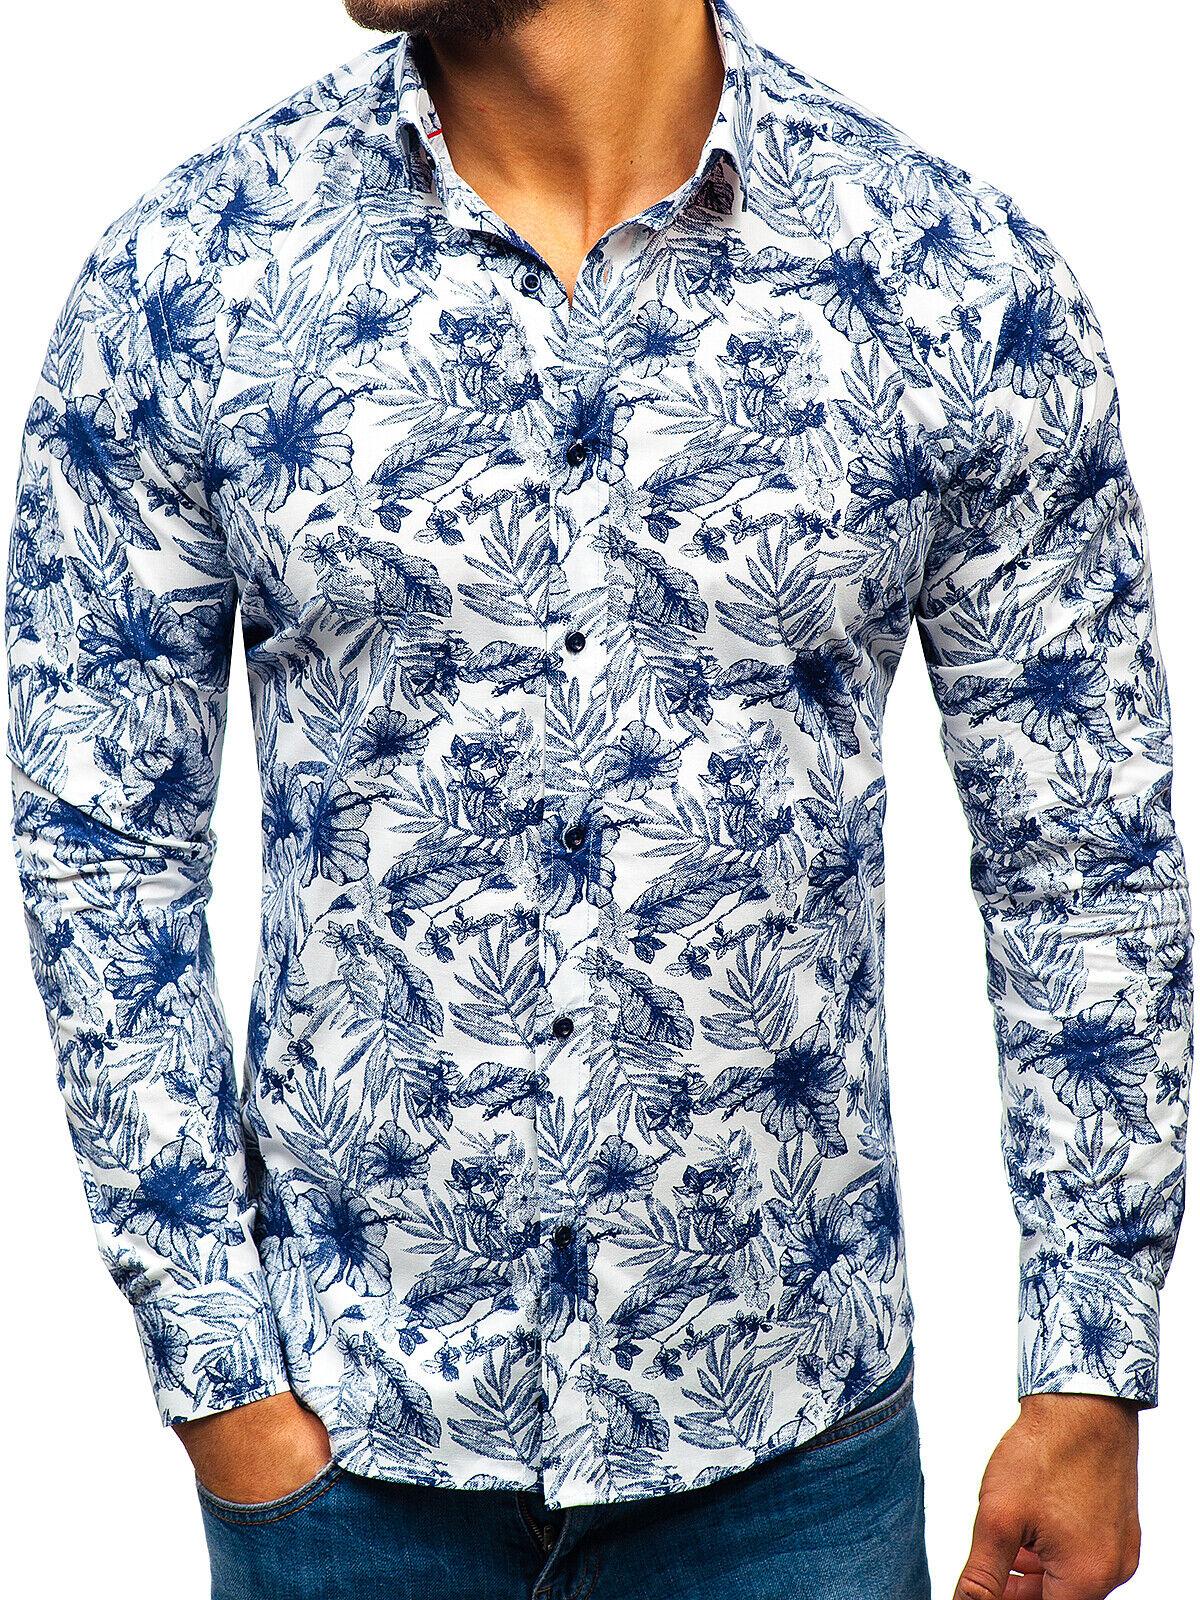 Freizeithemd Shirt Herrenhemd Langarm Hemd Slim Bedruck Herren BOLF 2B2 Classic